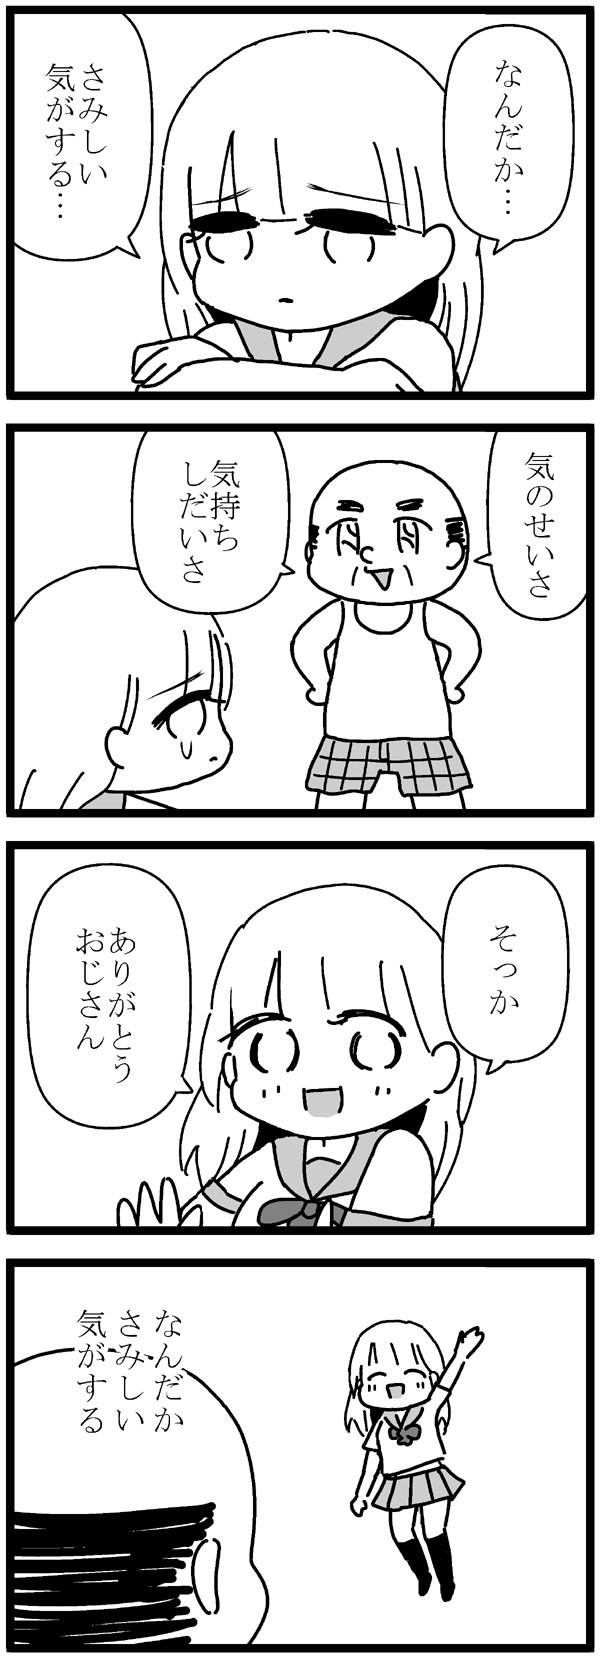 6fdbbee1.jpg